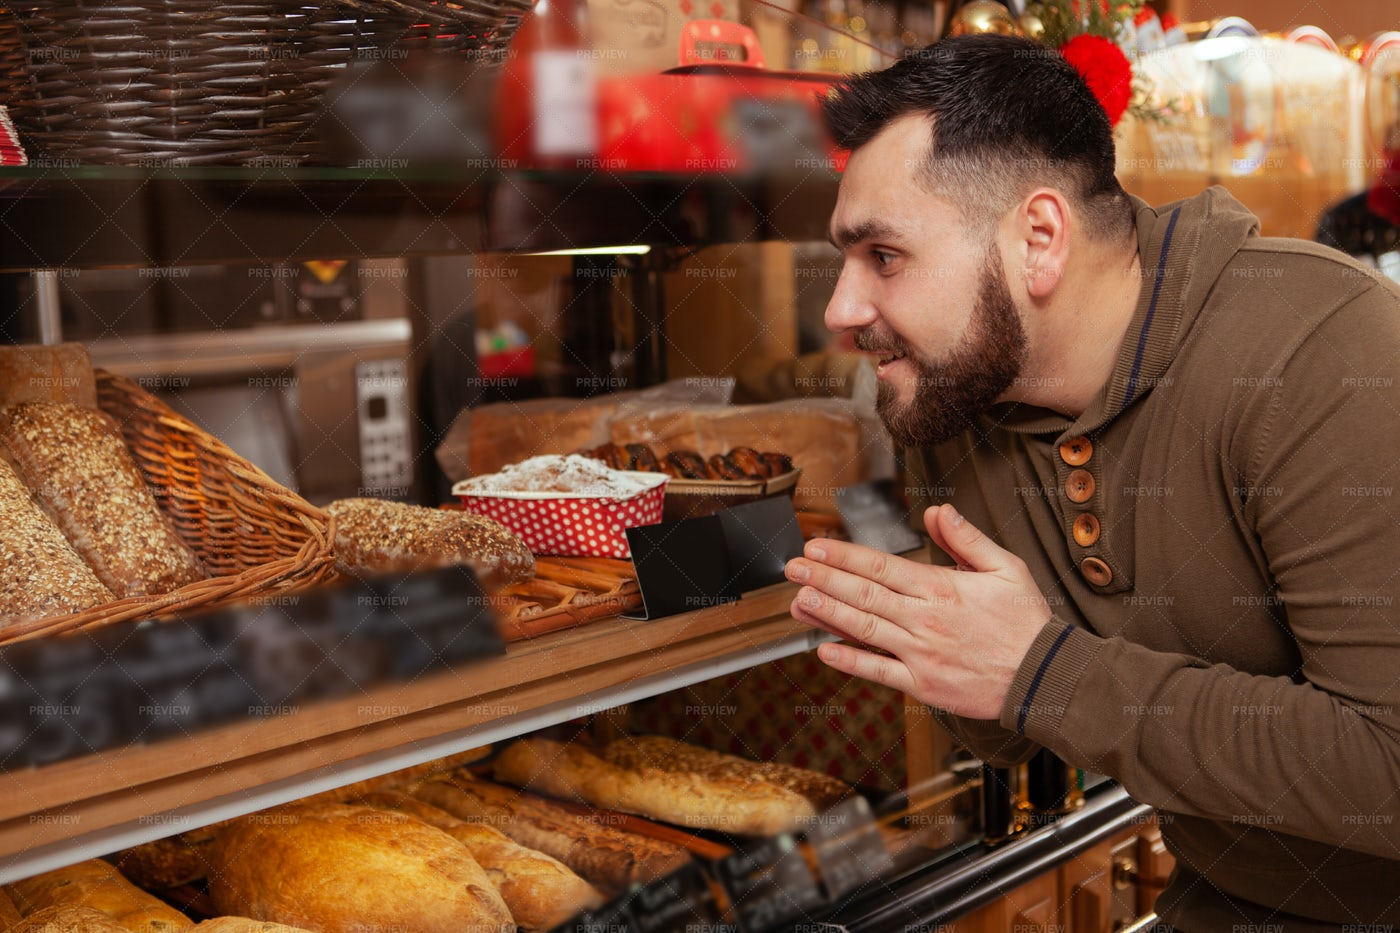 Selecting Baked Goods: Stock Photos